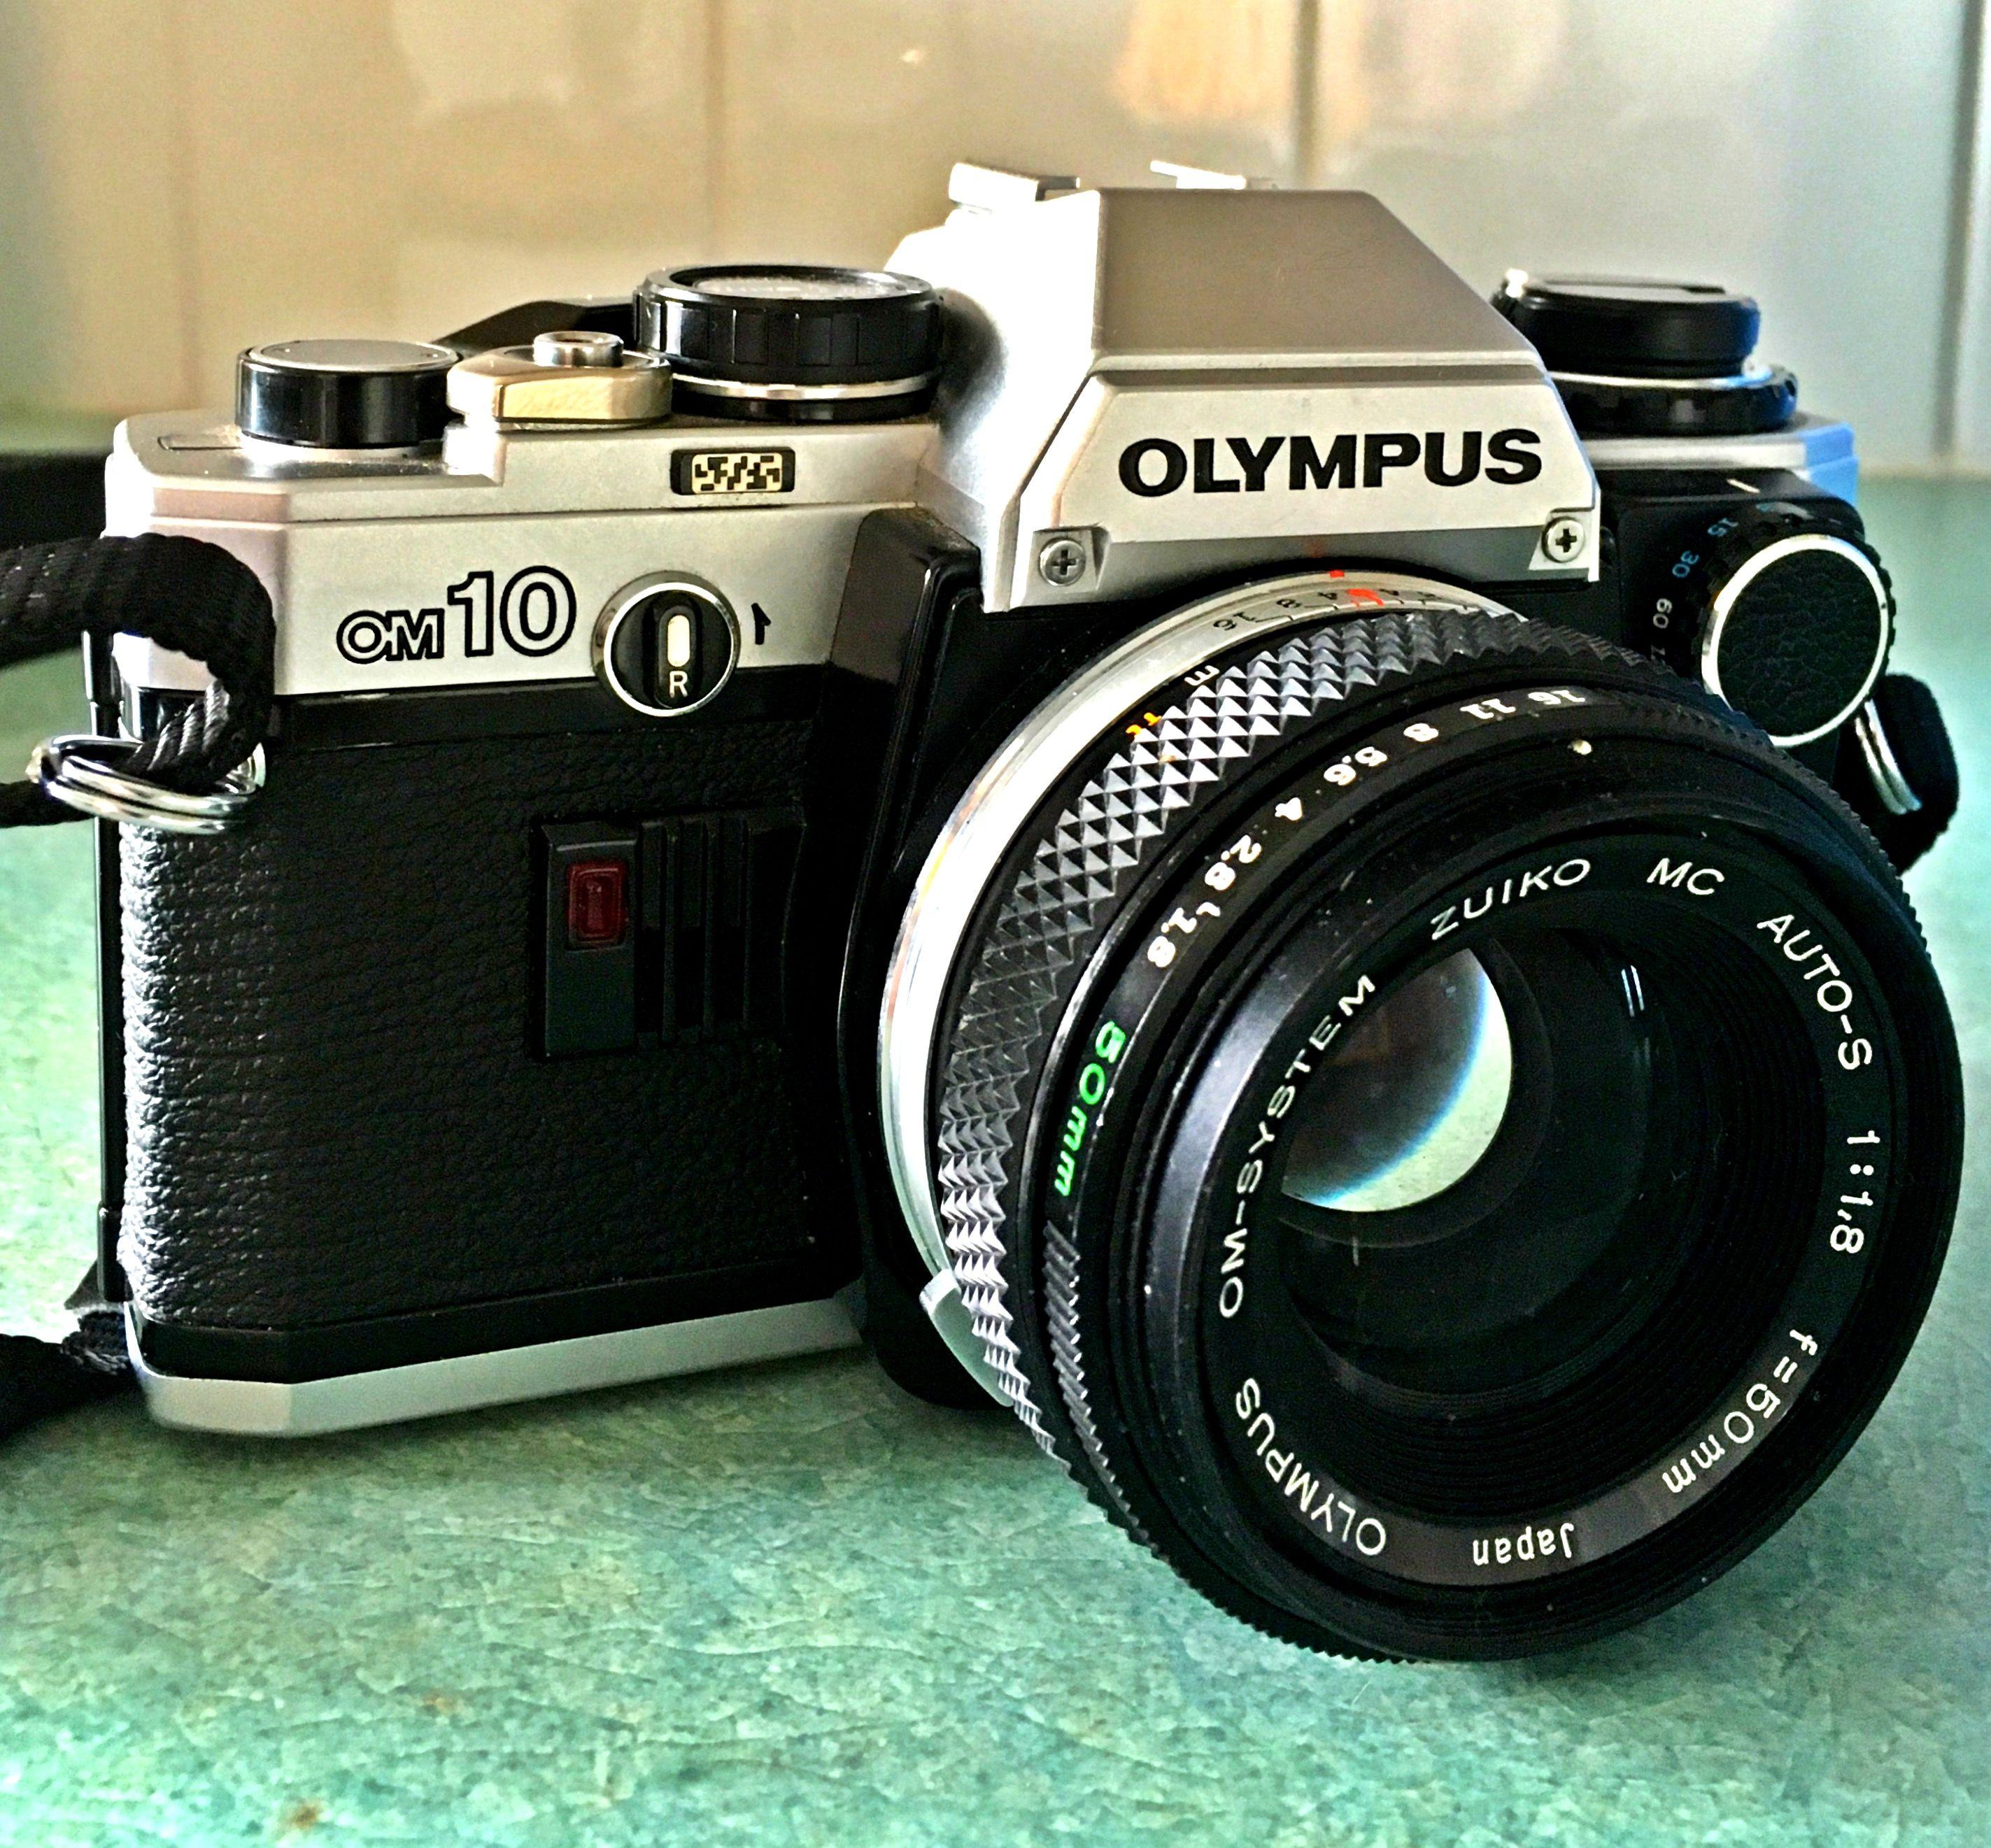 my olympus om10 with manual adapter classic cameras pinterest rh pinterest com Olympus OM10 SLR Film Camera Olympus OM10 Camera